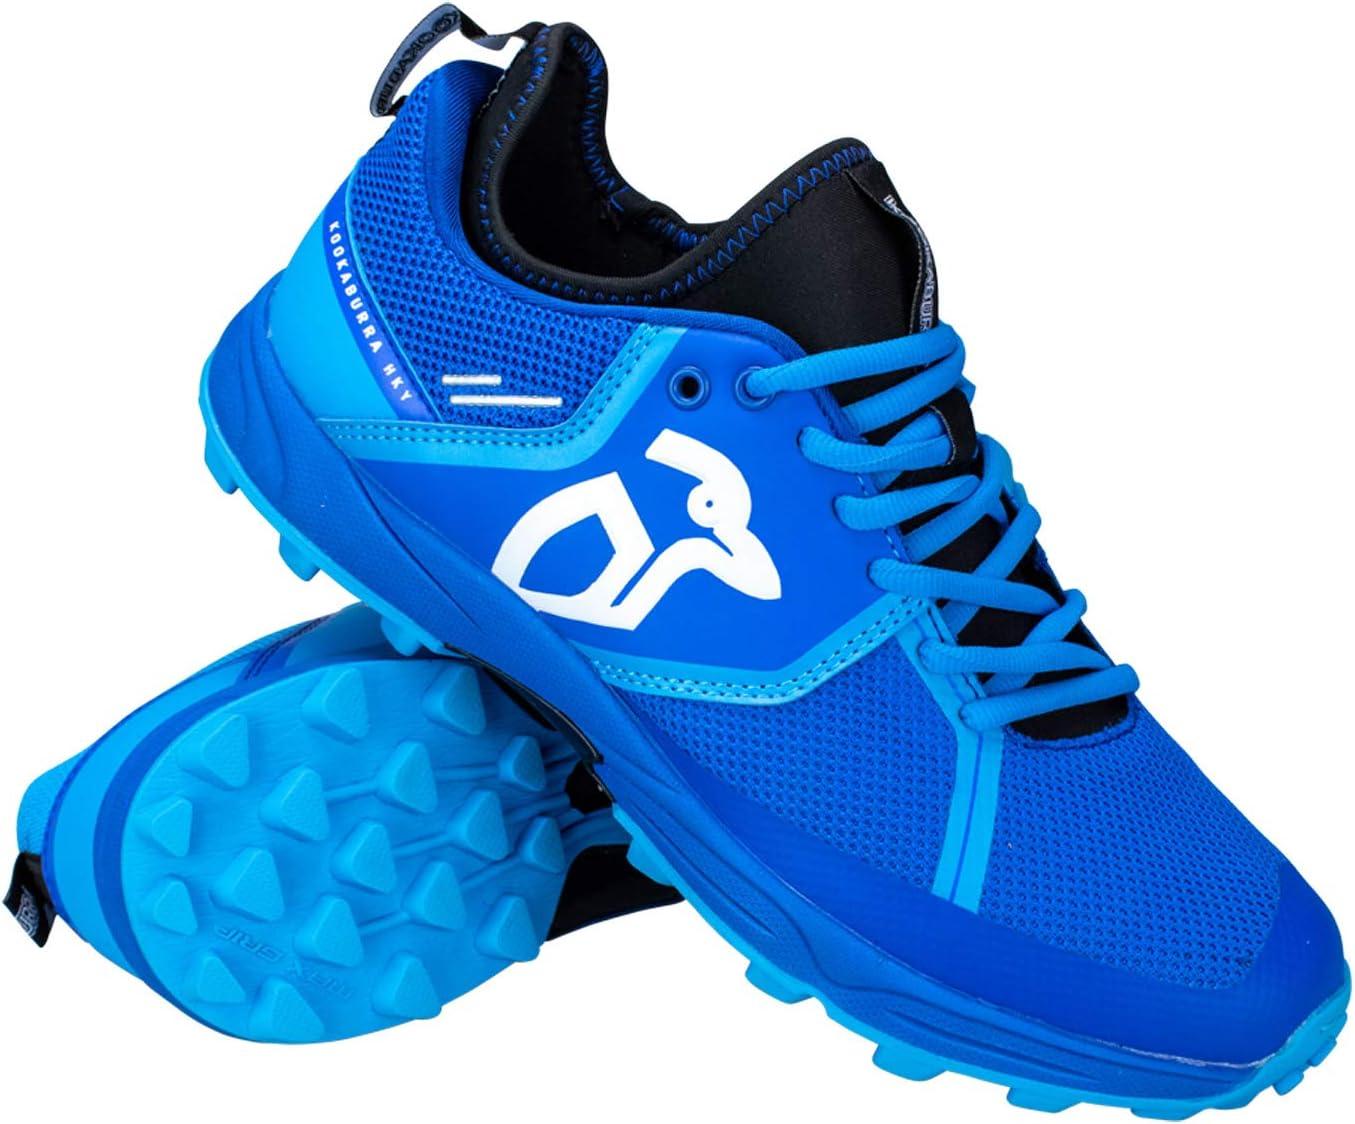 Color Azul Unisex KOOKABURRA Zapatillas de Hockey de xen/ón